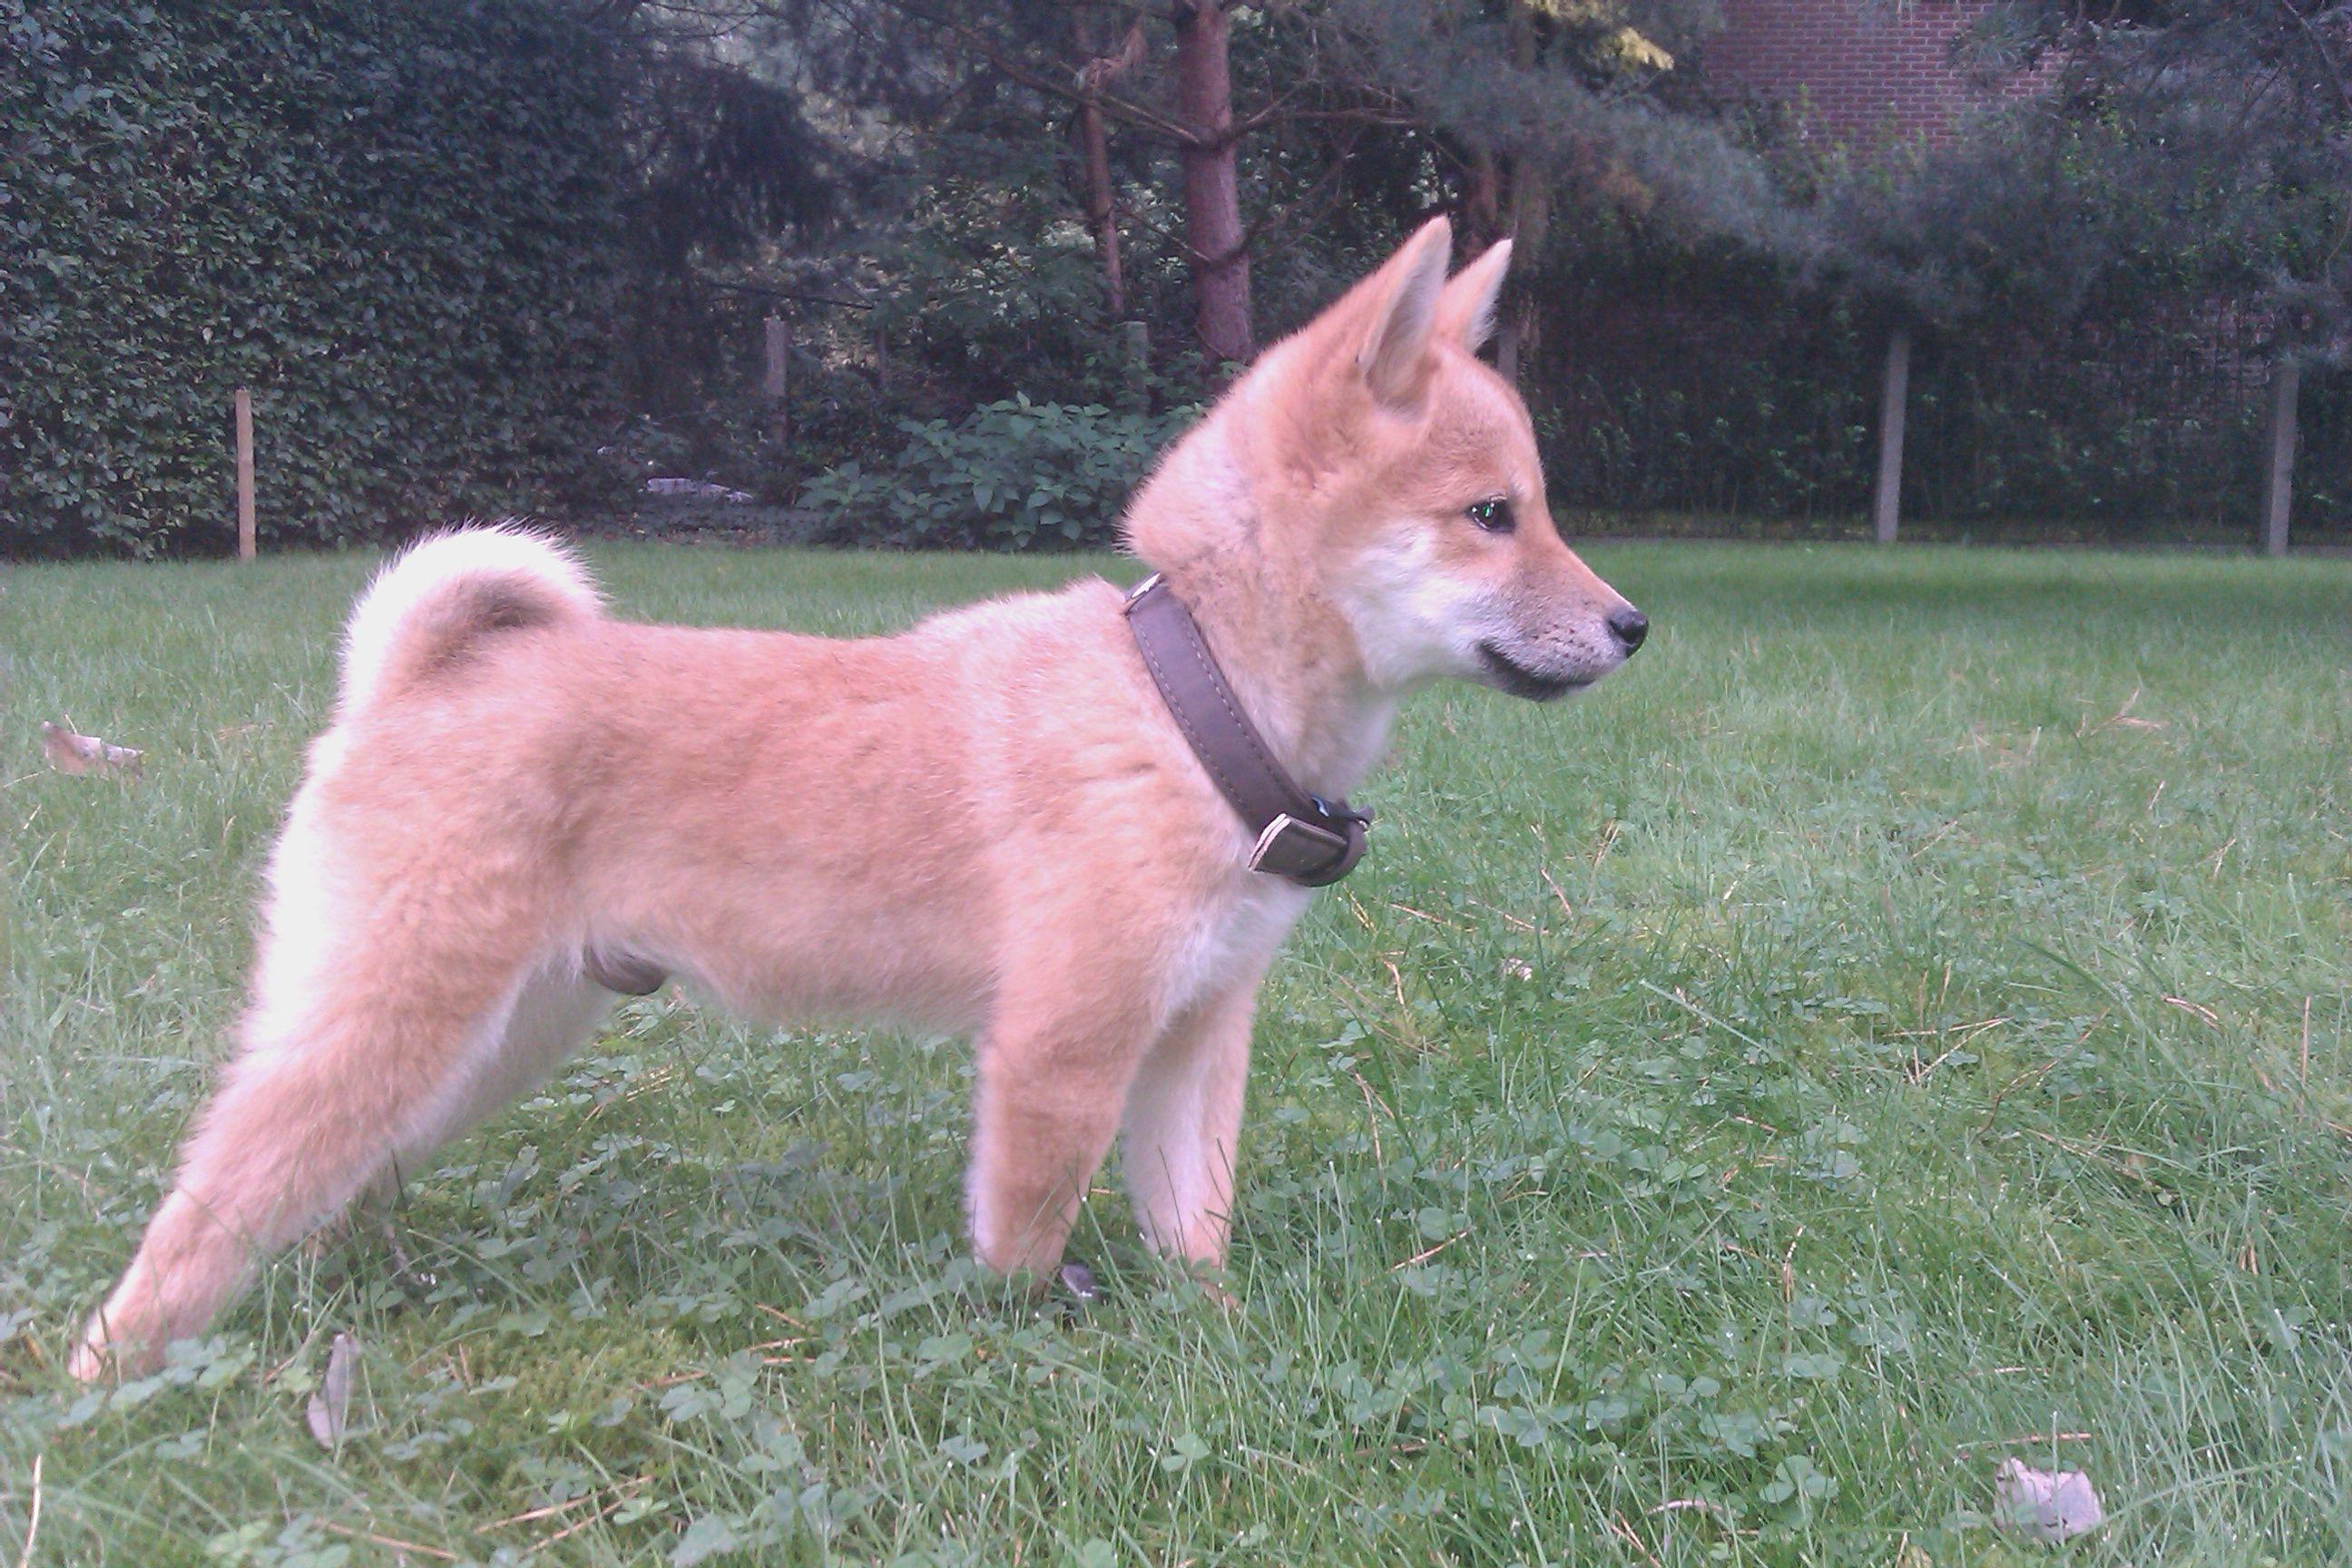 Shiba Inu 3 months old | Shiba inu, Dogs and puppies, I ...